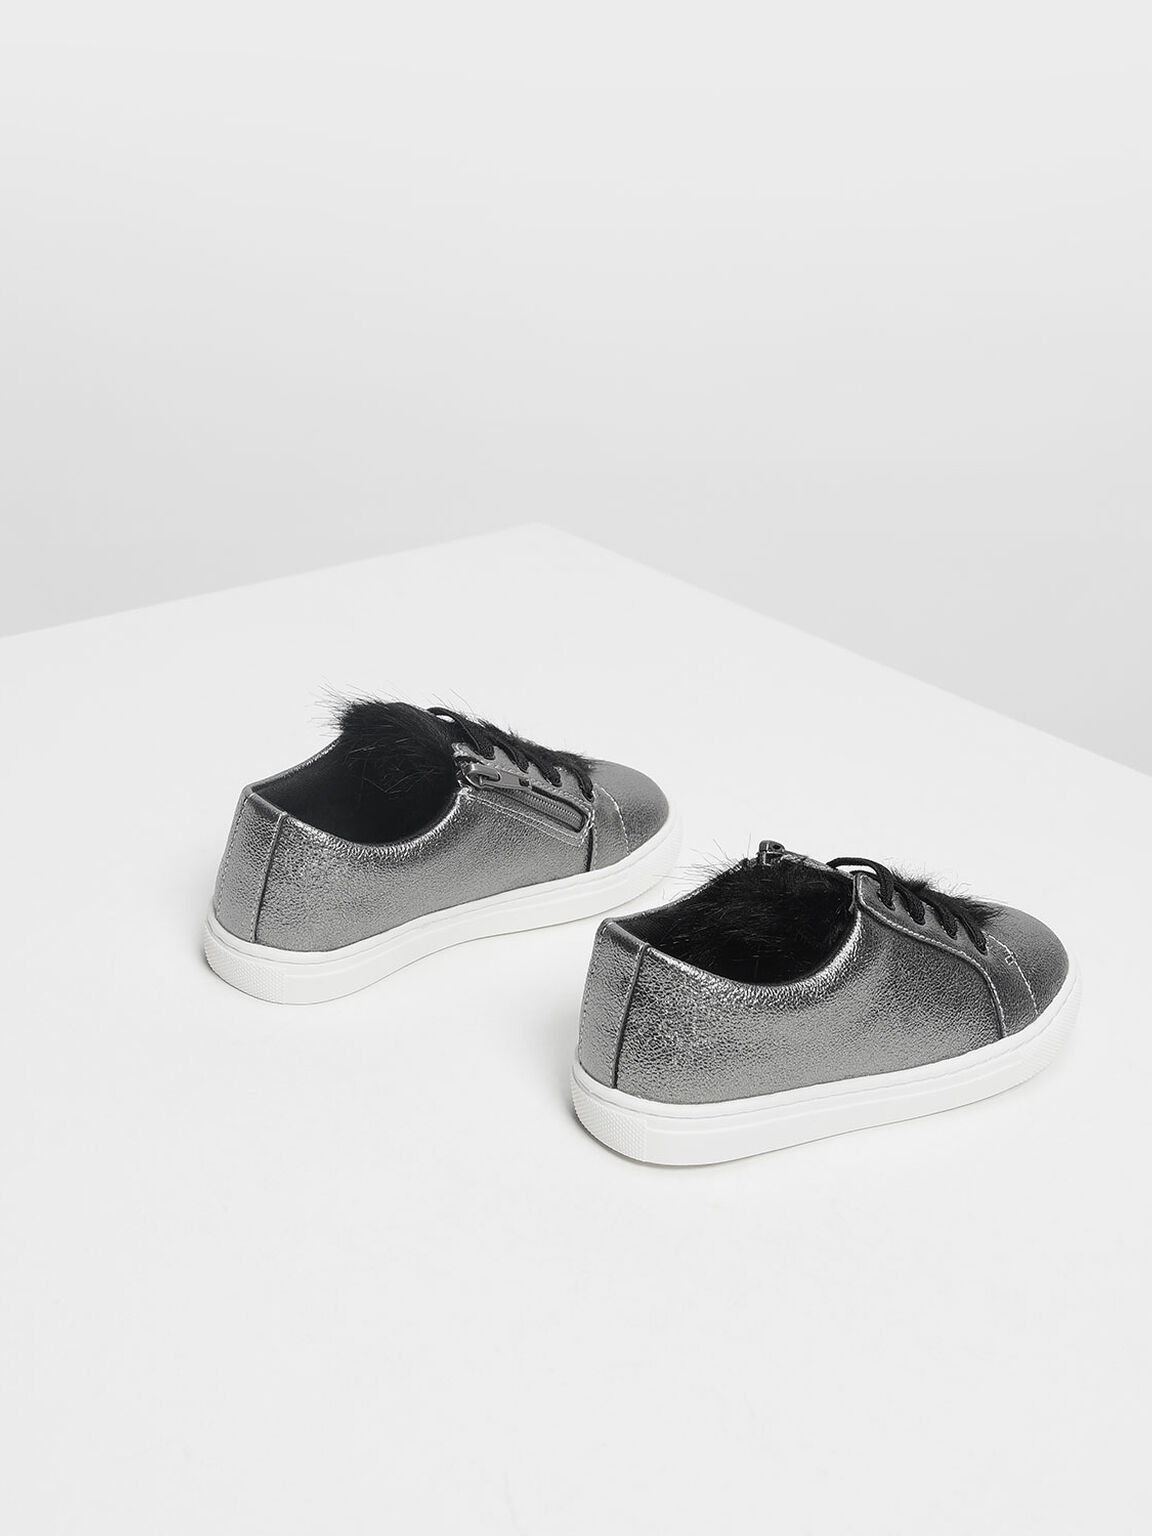 Kids Metallic Sneakers, Pewter, hi-res